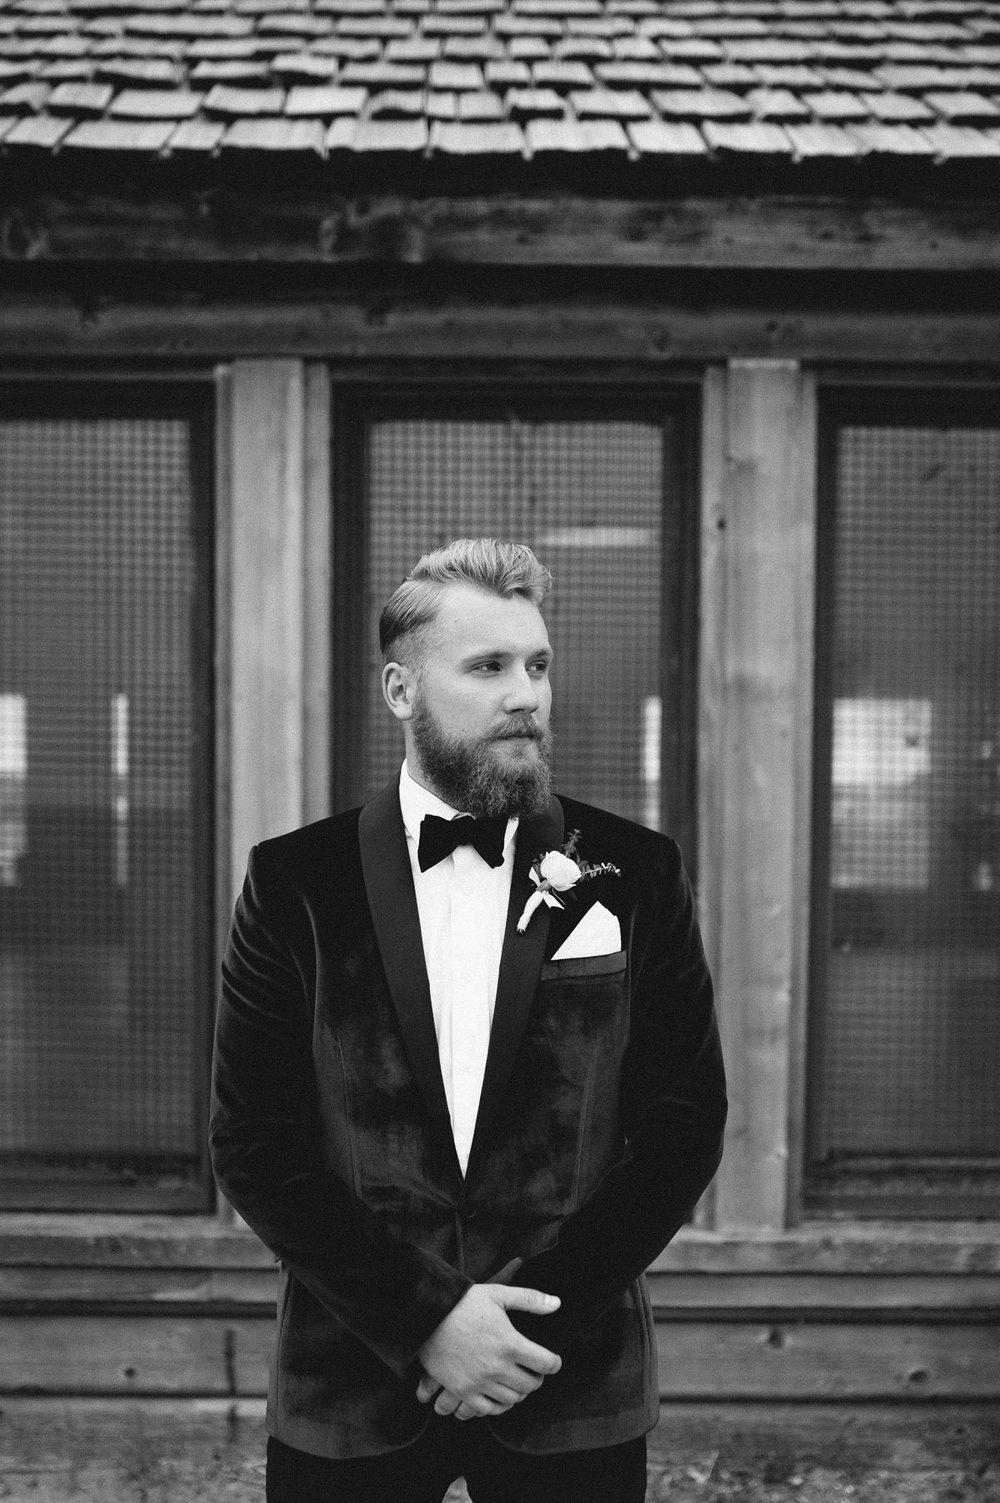 13-handsome groom wedding photos.jpg